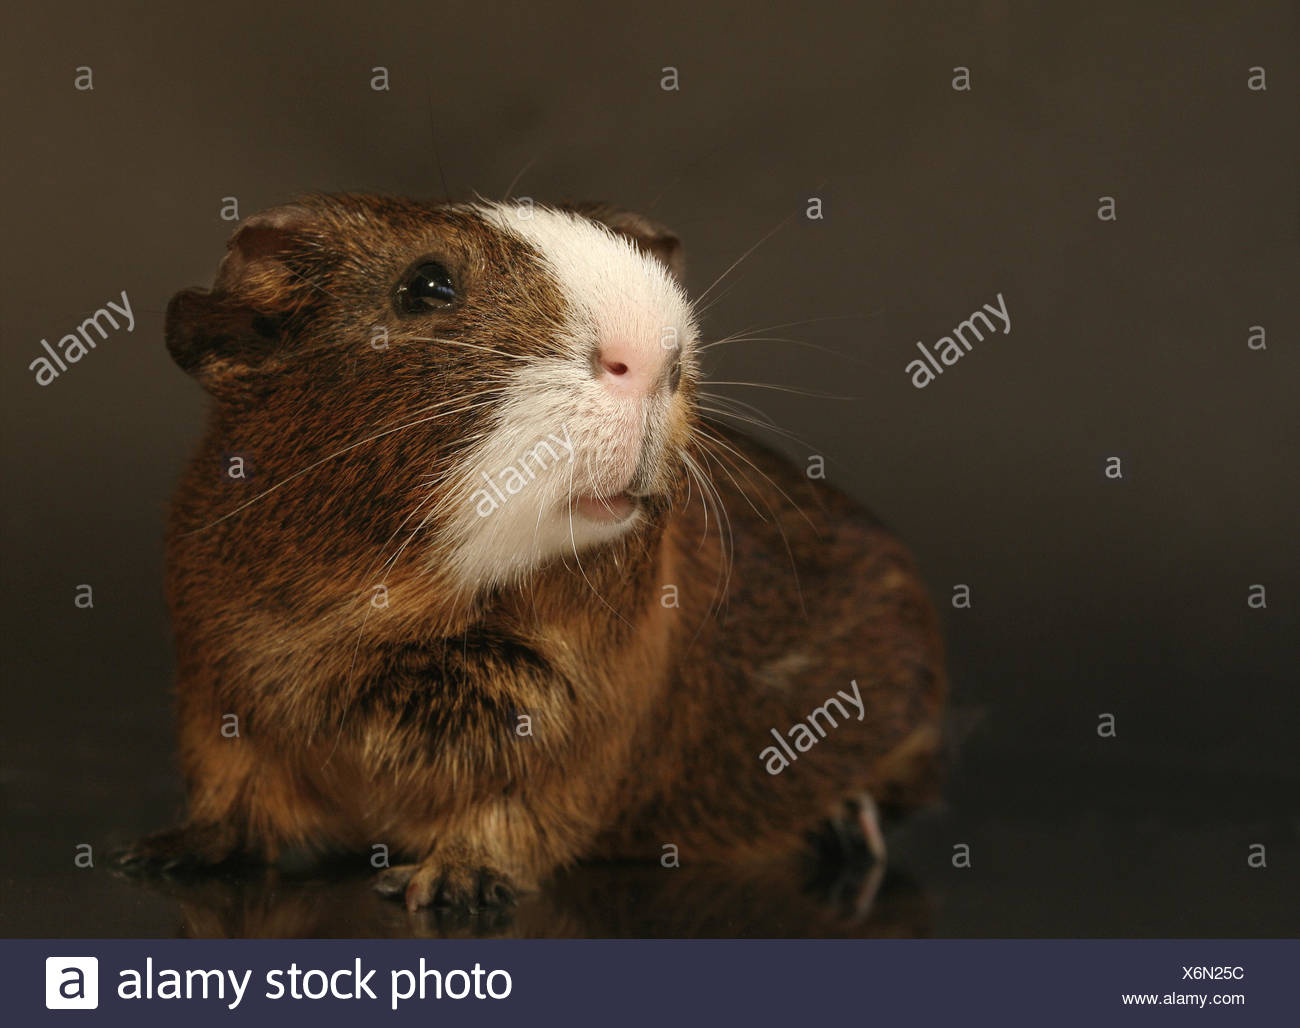 pet brown brownish brunette rodent caress guinea-pig guinea pig knopfauge Stock Photo